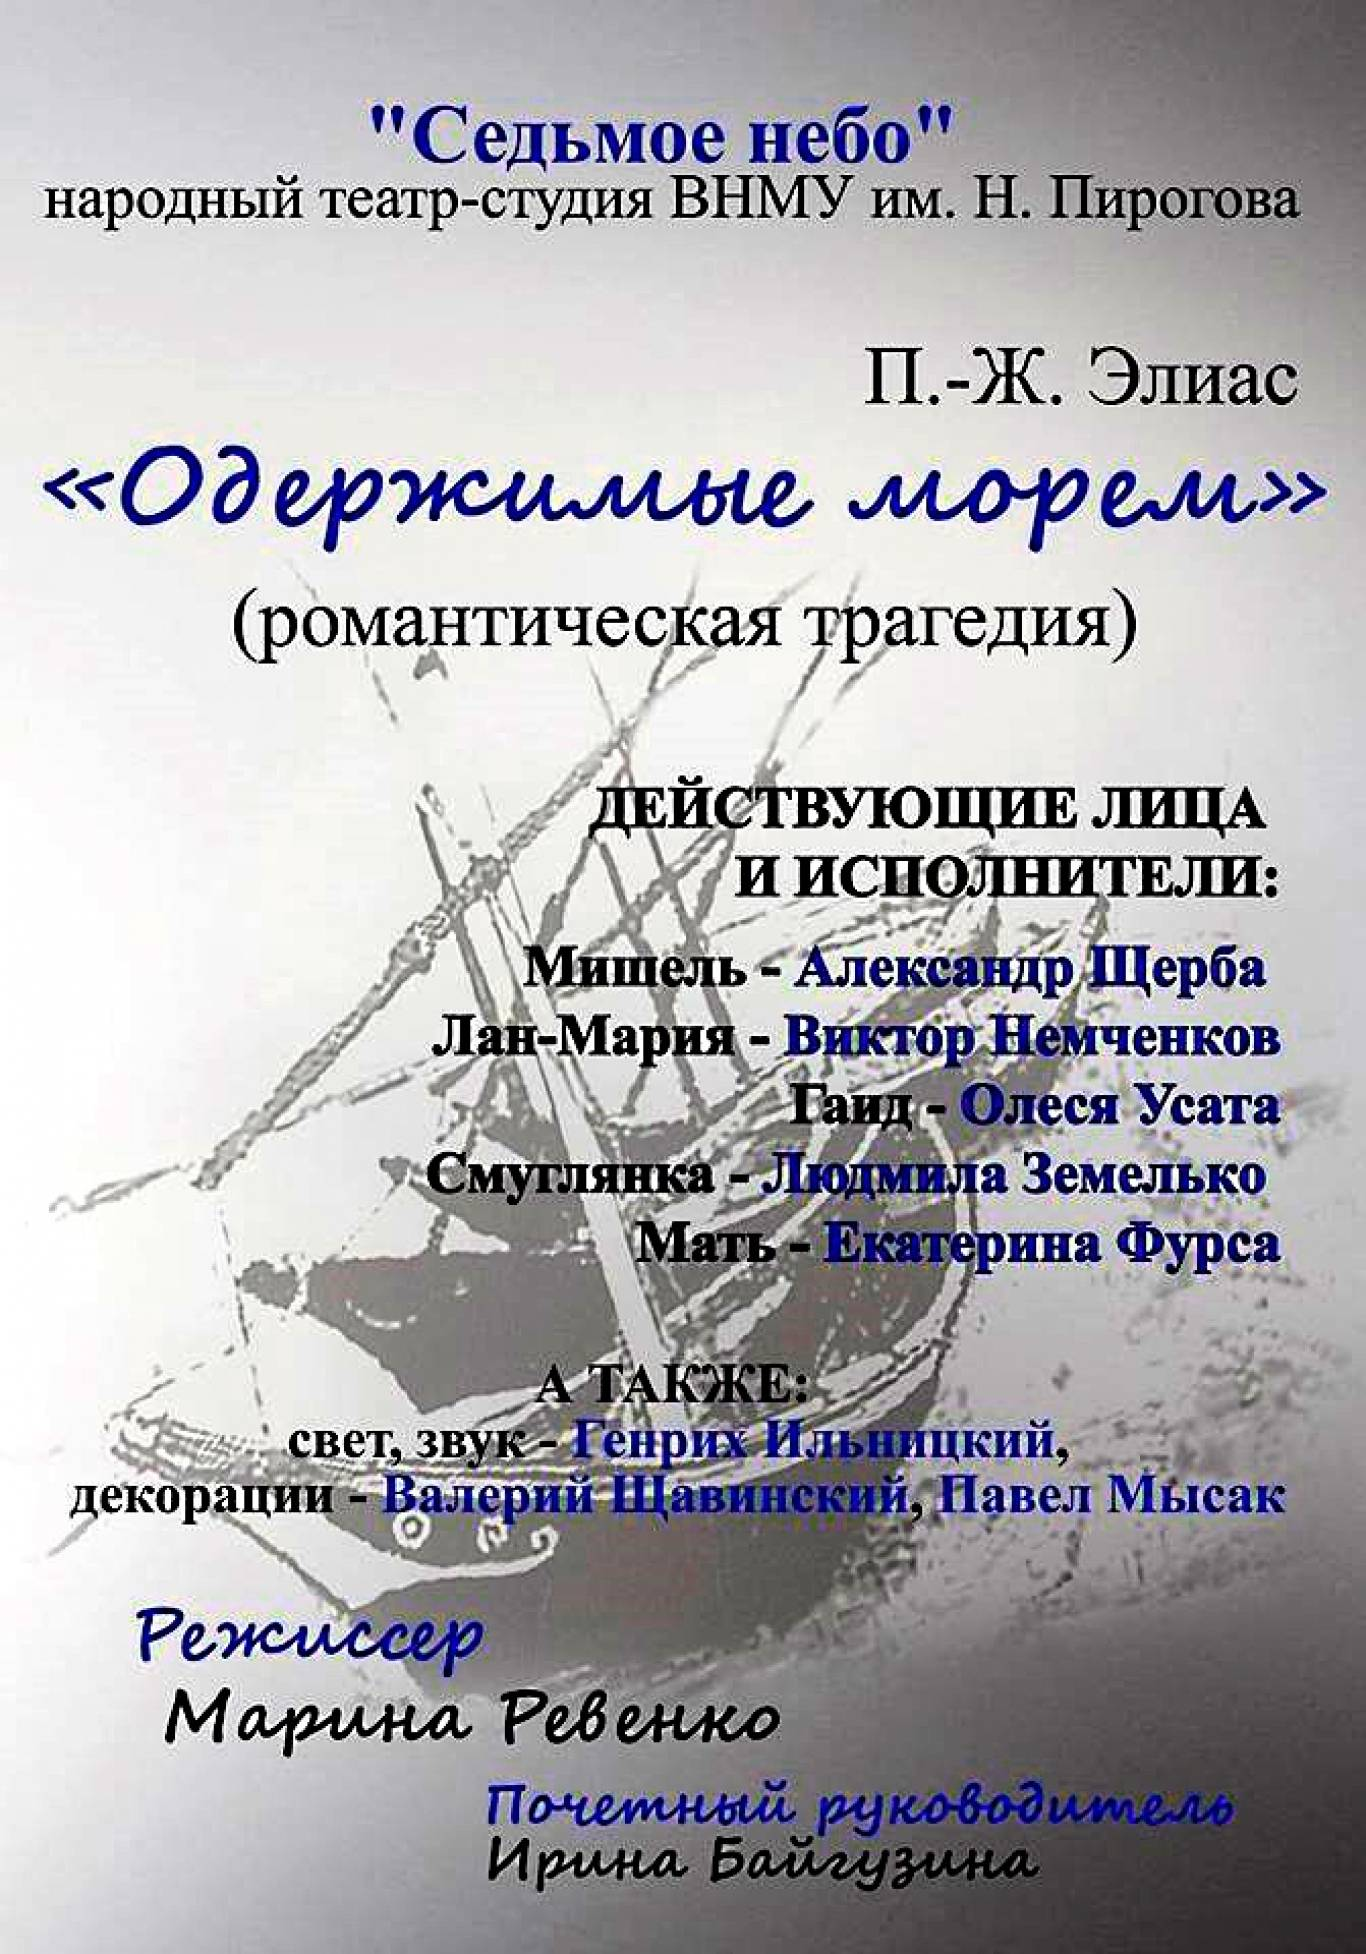 Вистава «Одержимые морем» Вінницького народного театру-студії «Сьоме небо»